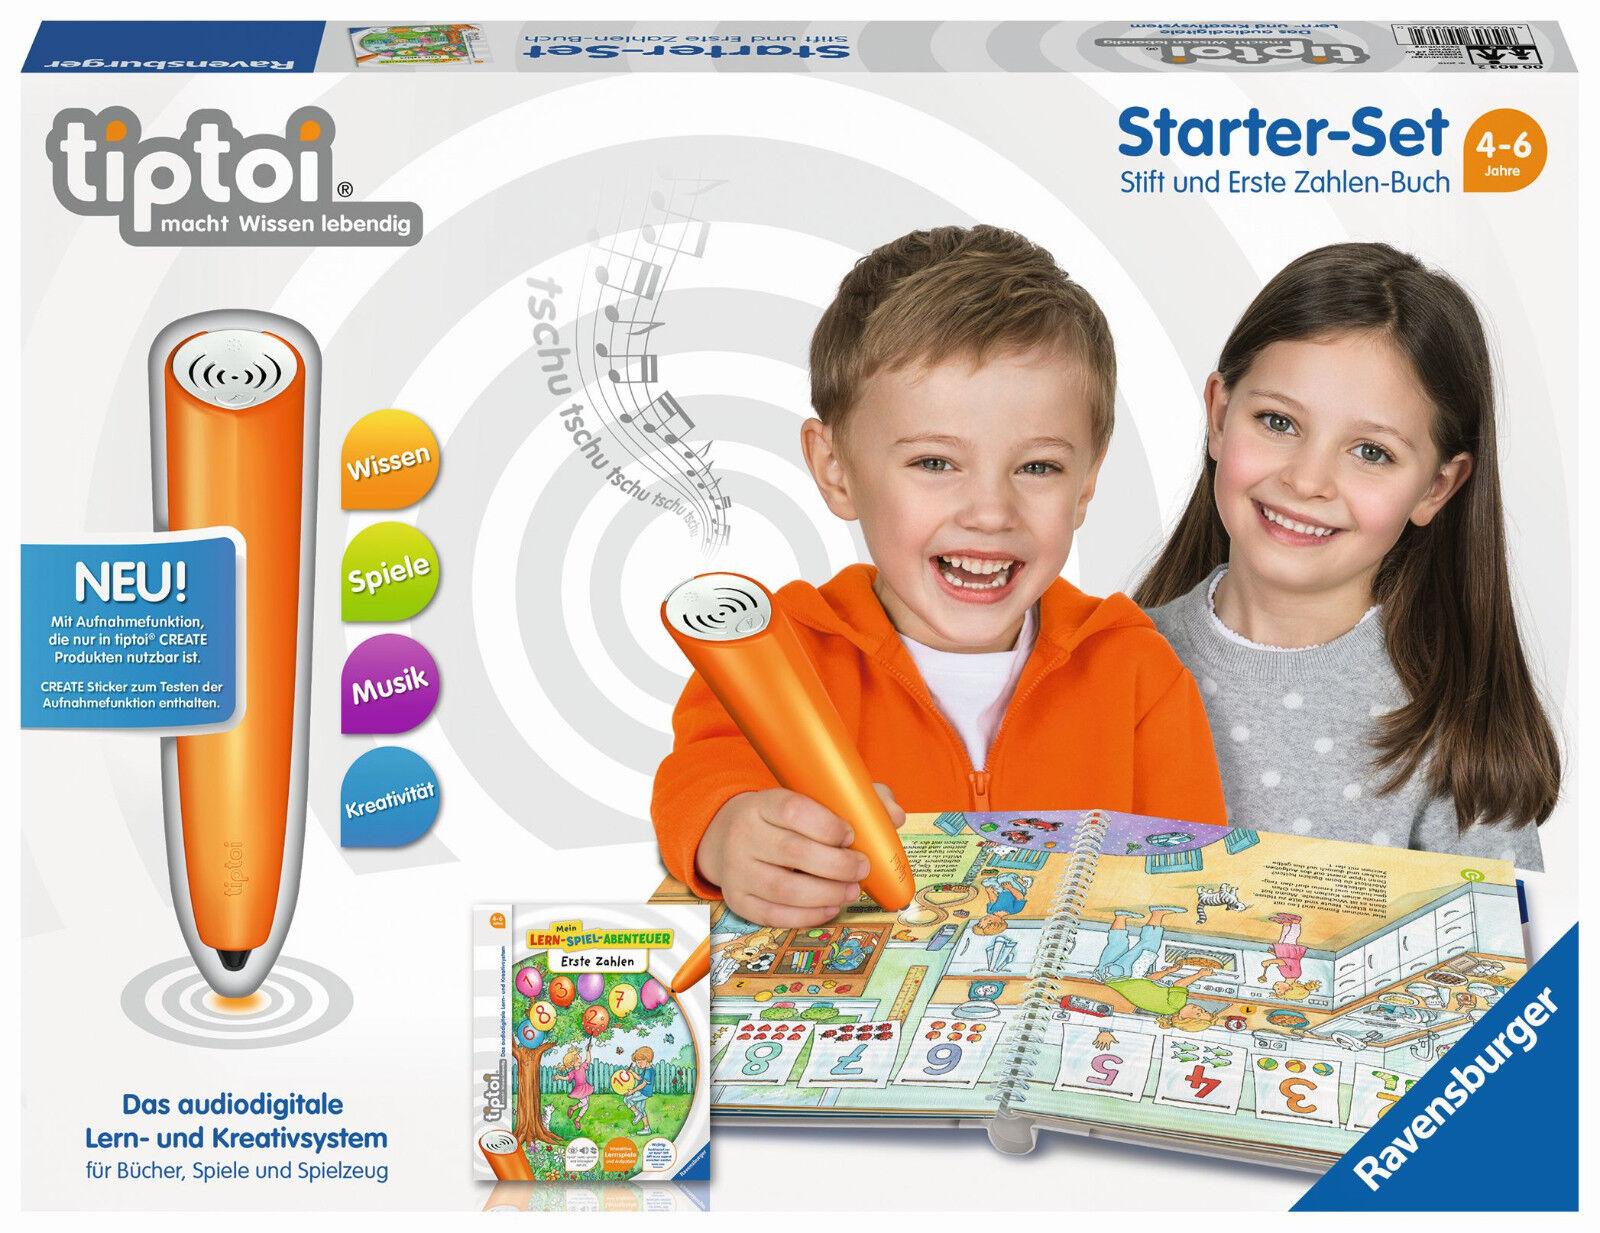 Tavensburger Tiptoi - Starter Set, Pin and First Zahlen-Buch, Nip